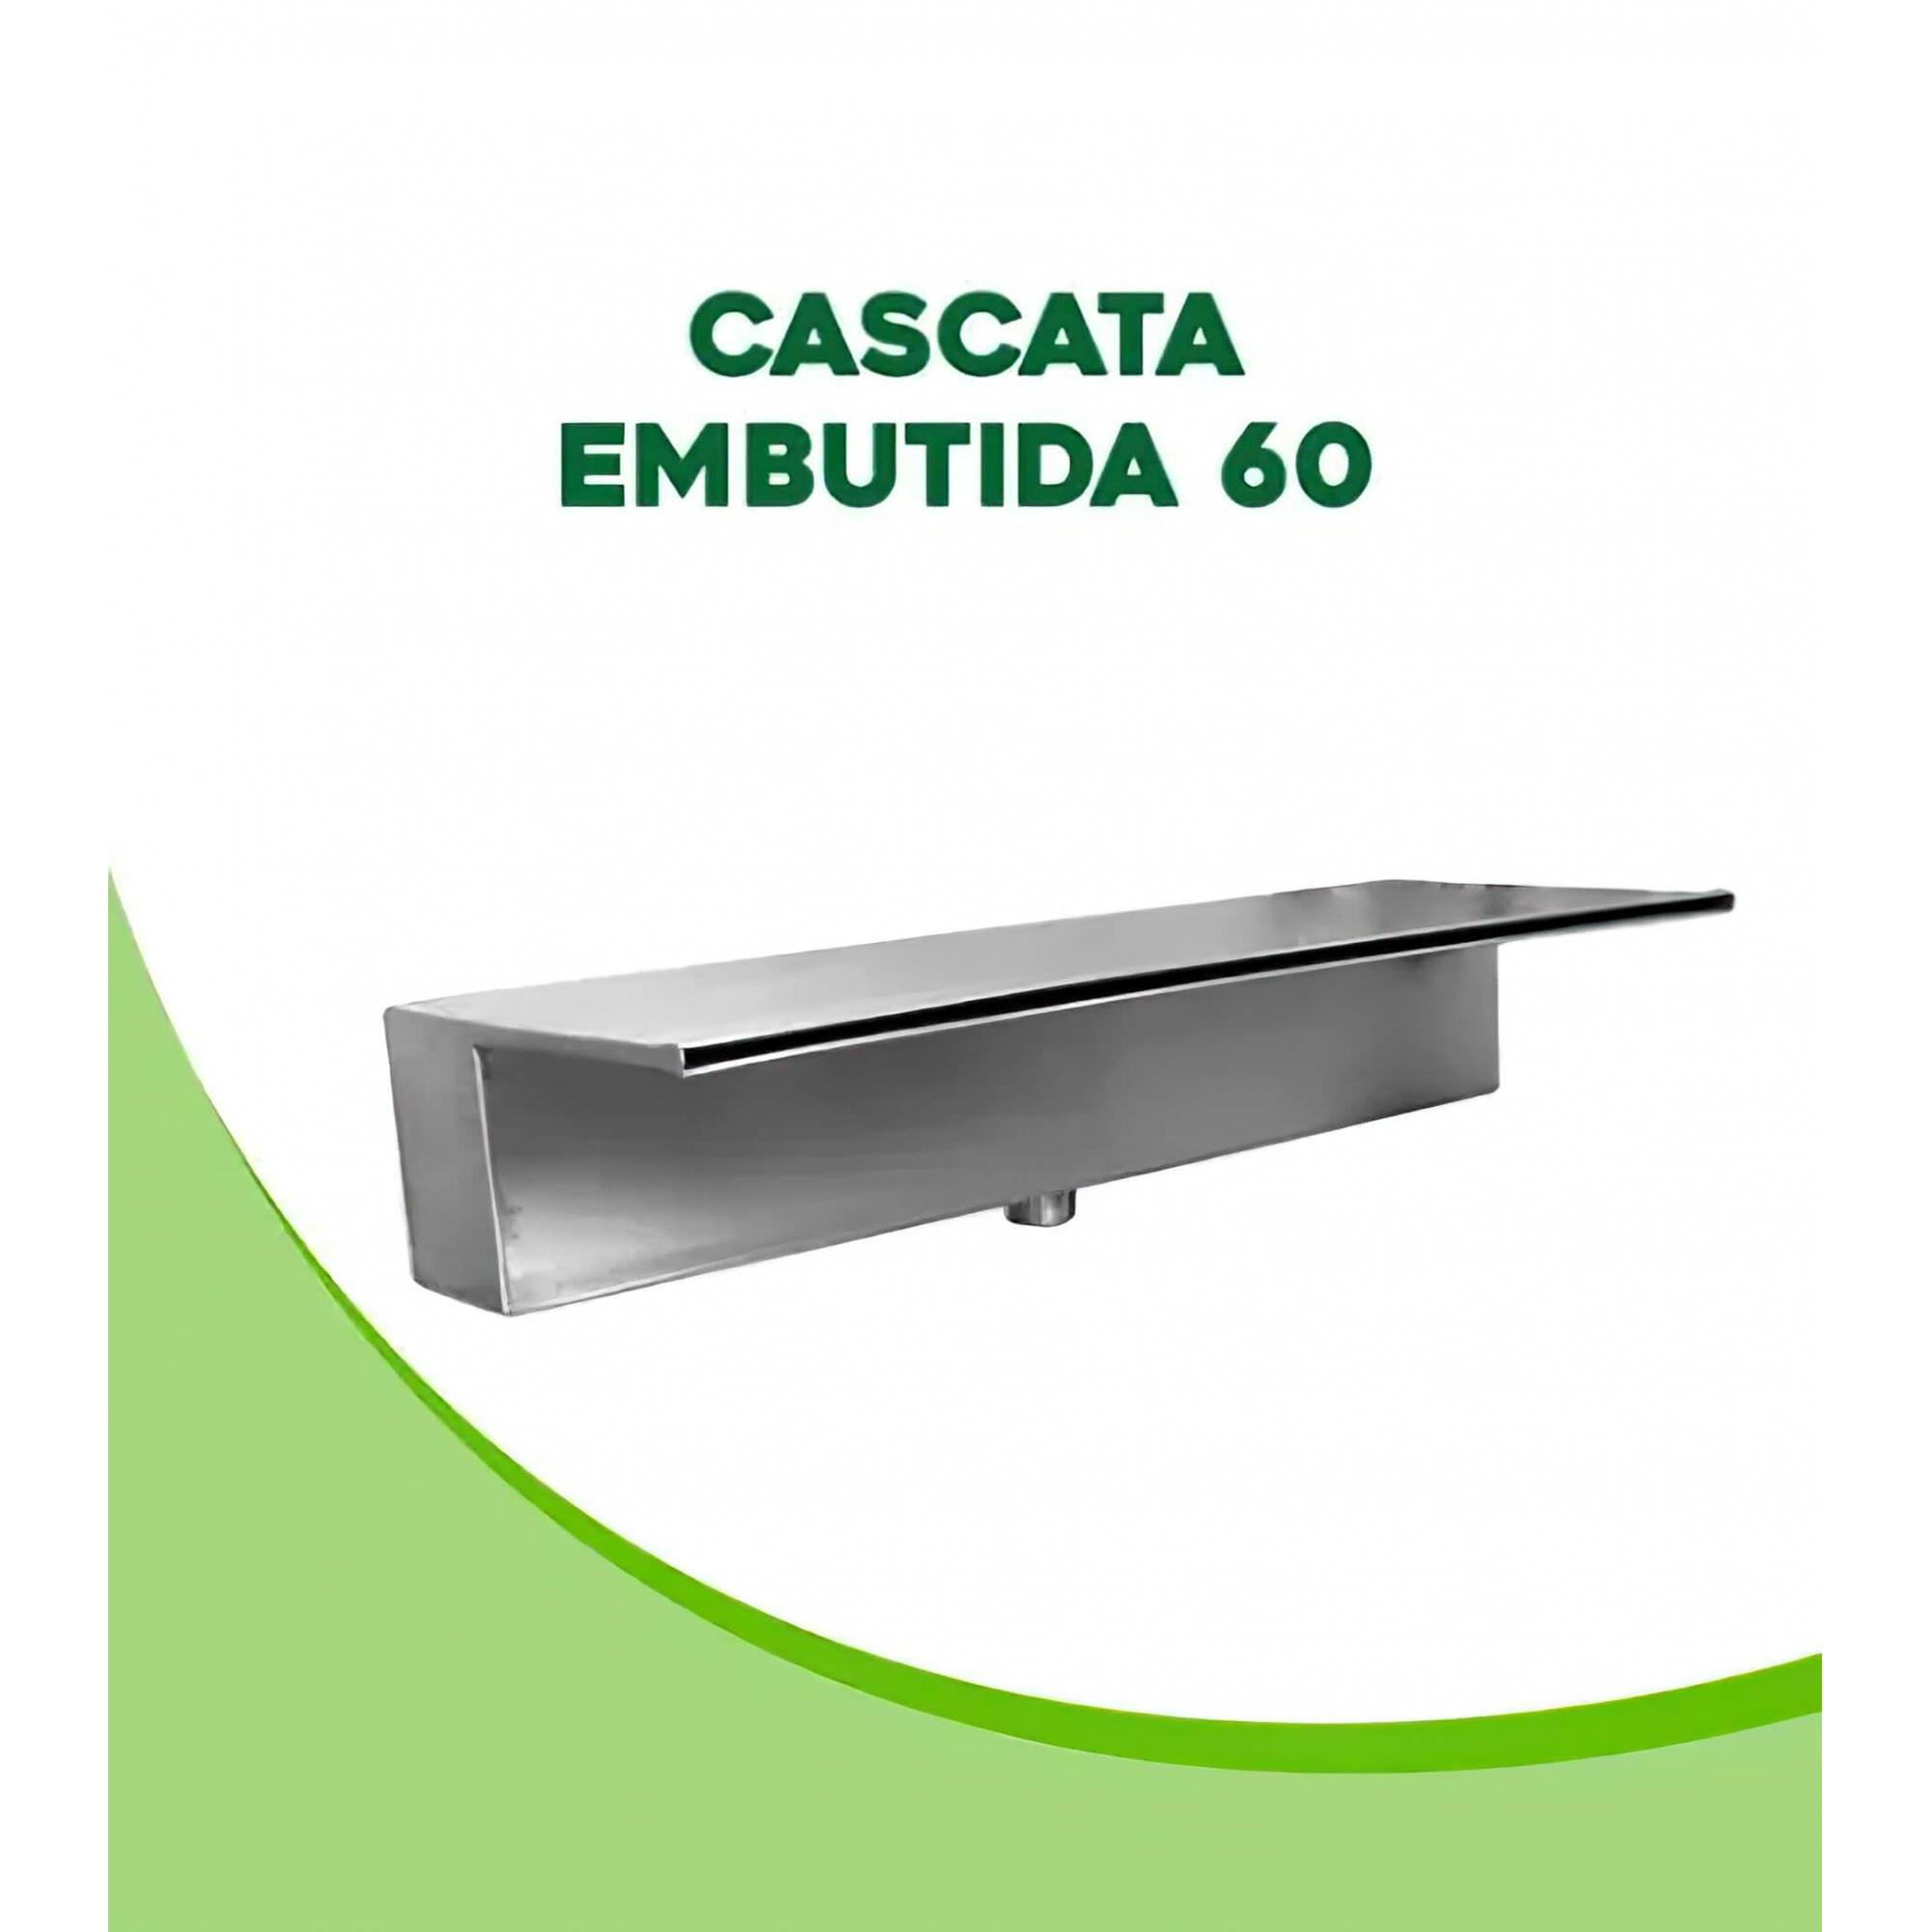 Cascata para Piscina de Embutir inox 60cm